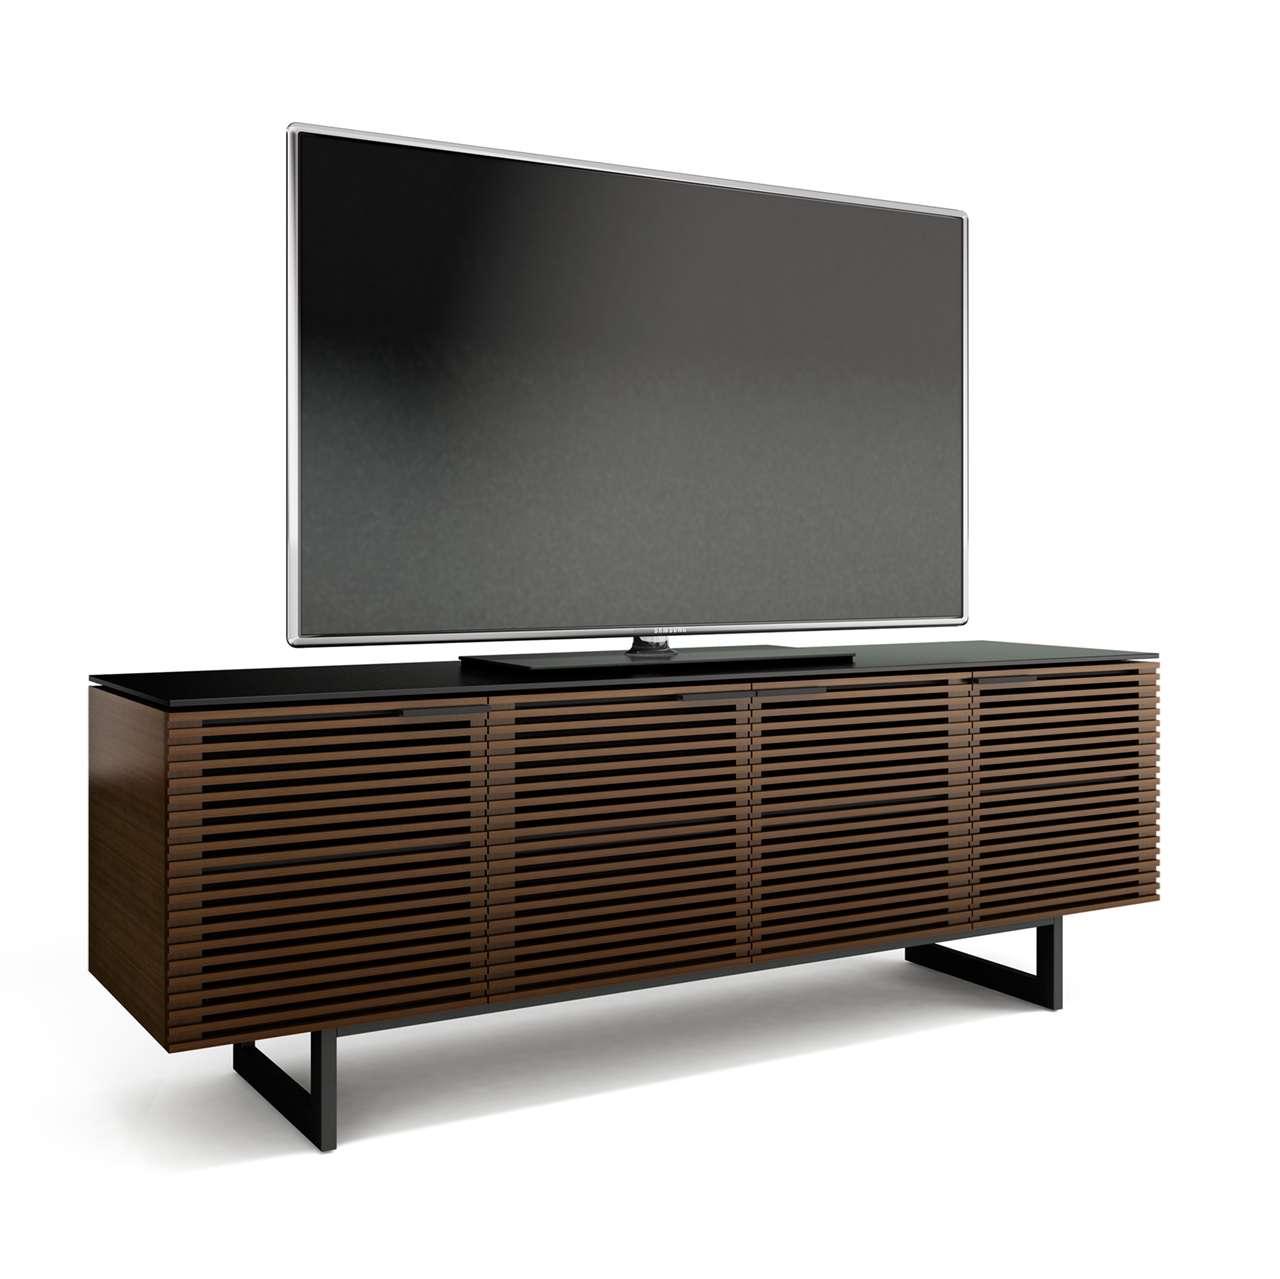 Surprising Top 10 Best Tv Stands Blog Smart Furniture Andrewgaddart Wooden Chair Designs For Living Room Andrewgaddartcom